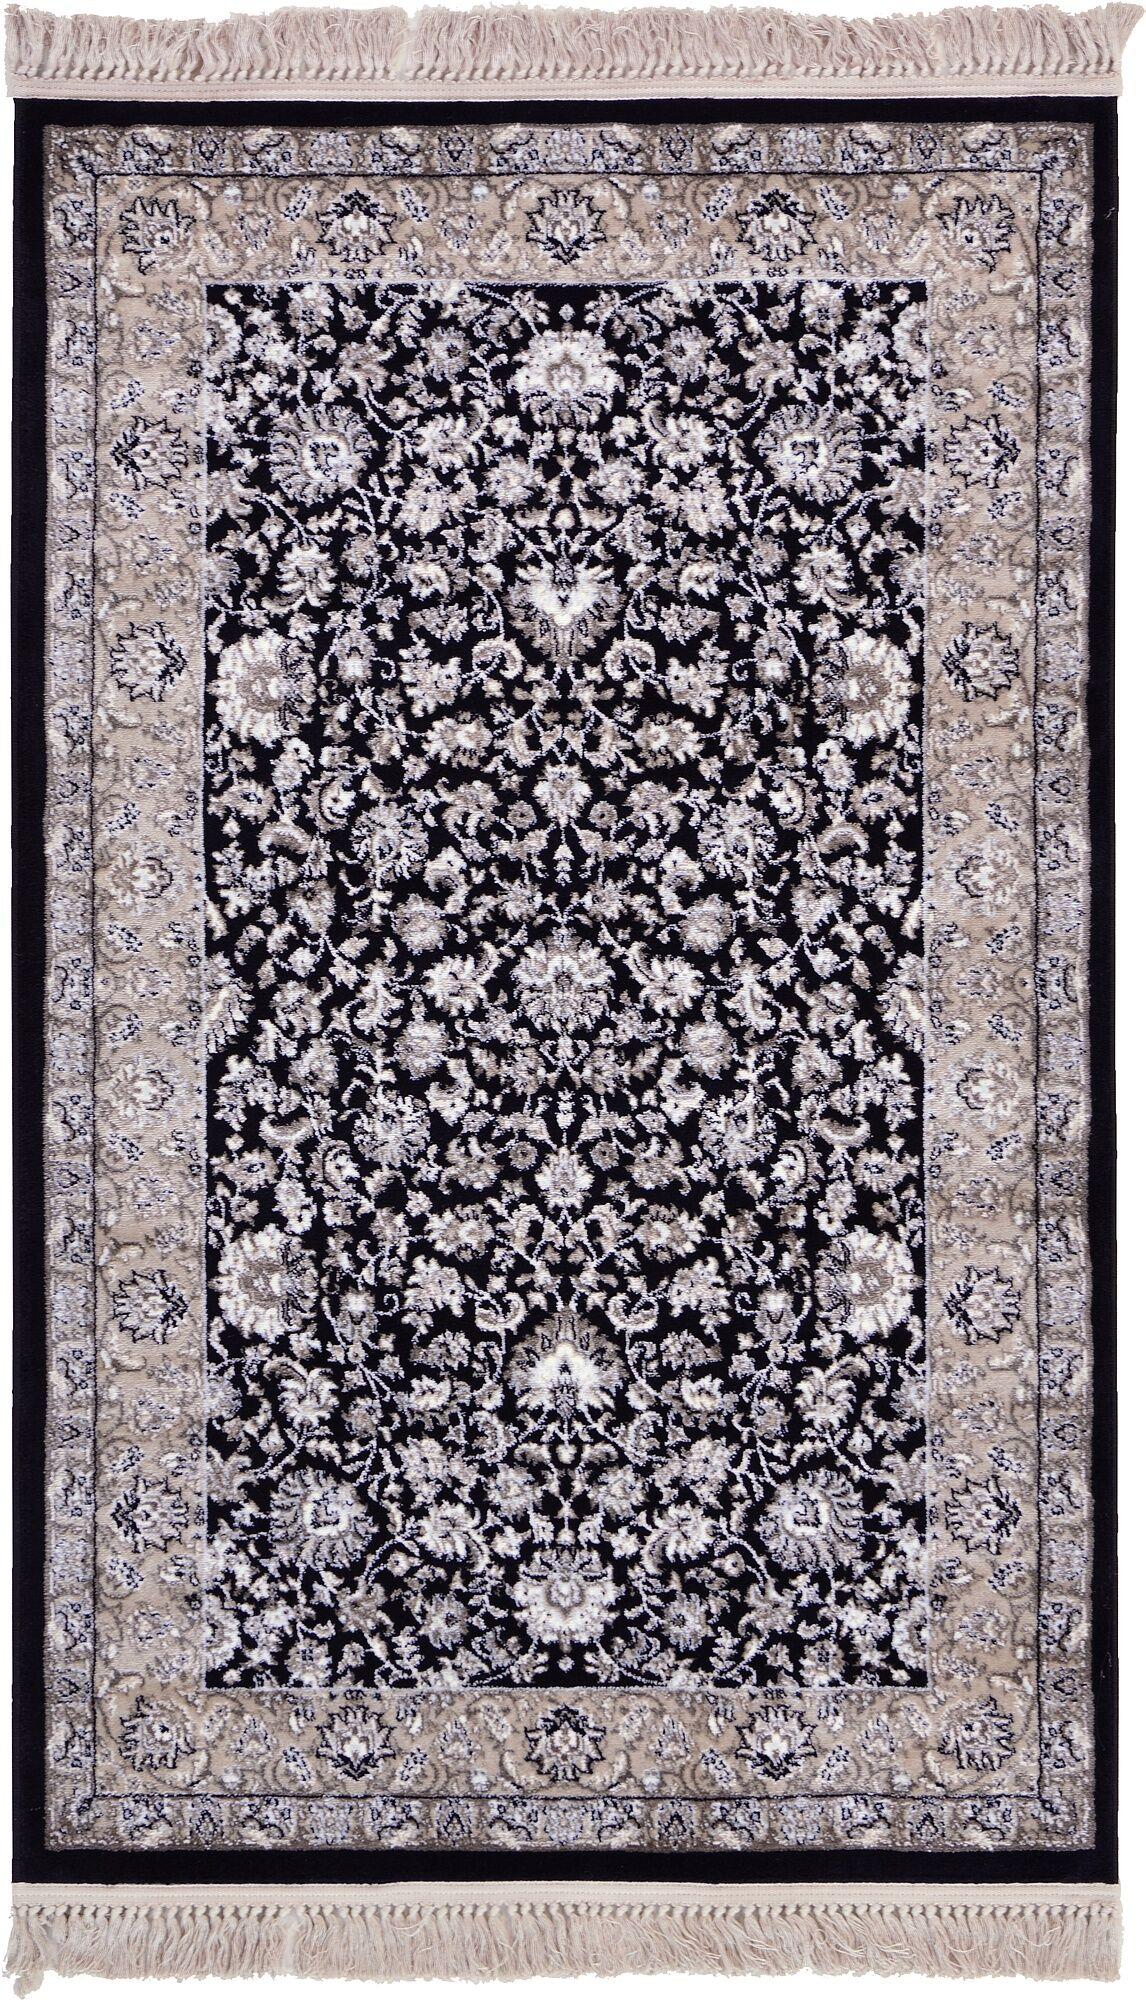 Essehoul Black Area Rug Rug Size: Rectangle 5' x 8'